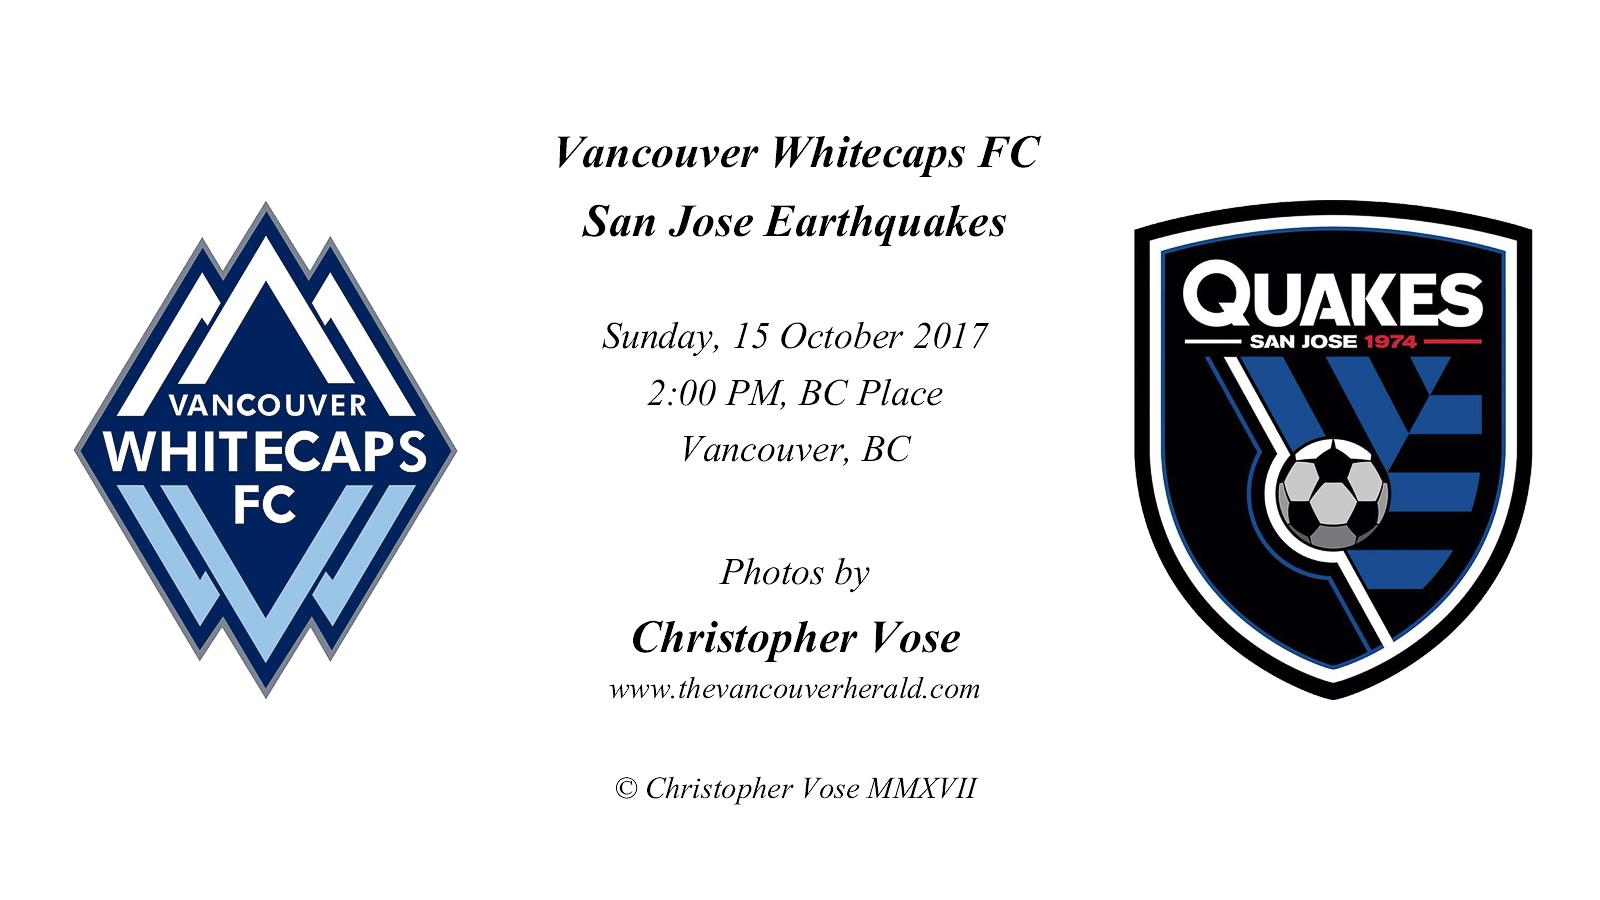 2017-10-15 Vancouver Whitecaps FC v San Jose Earthquakes.jpg